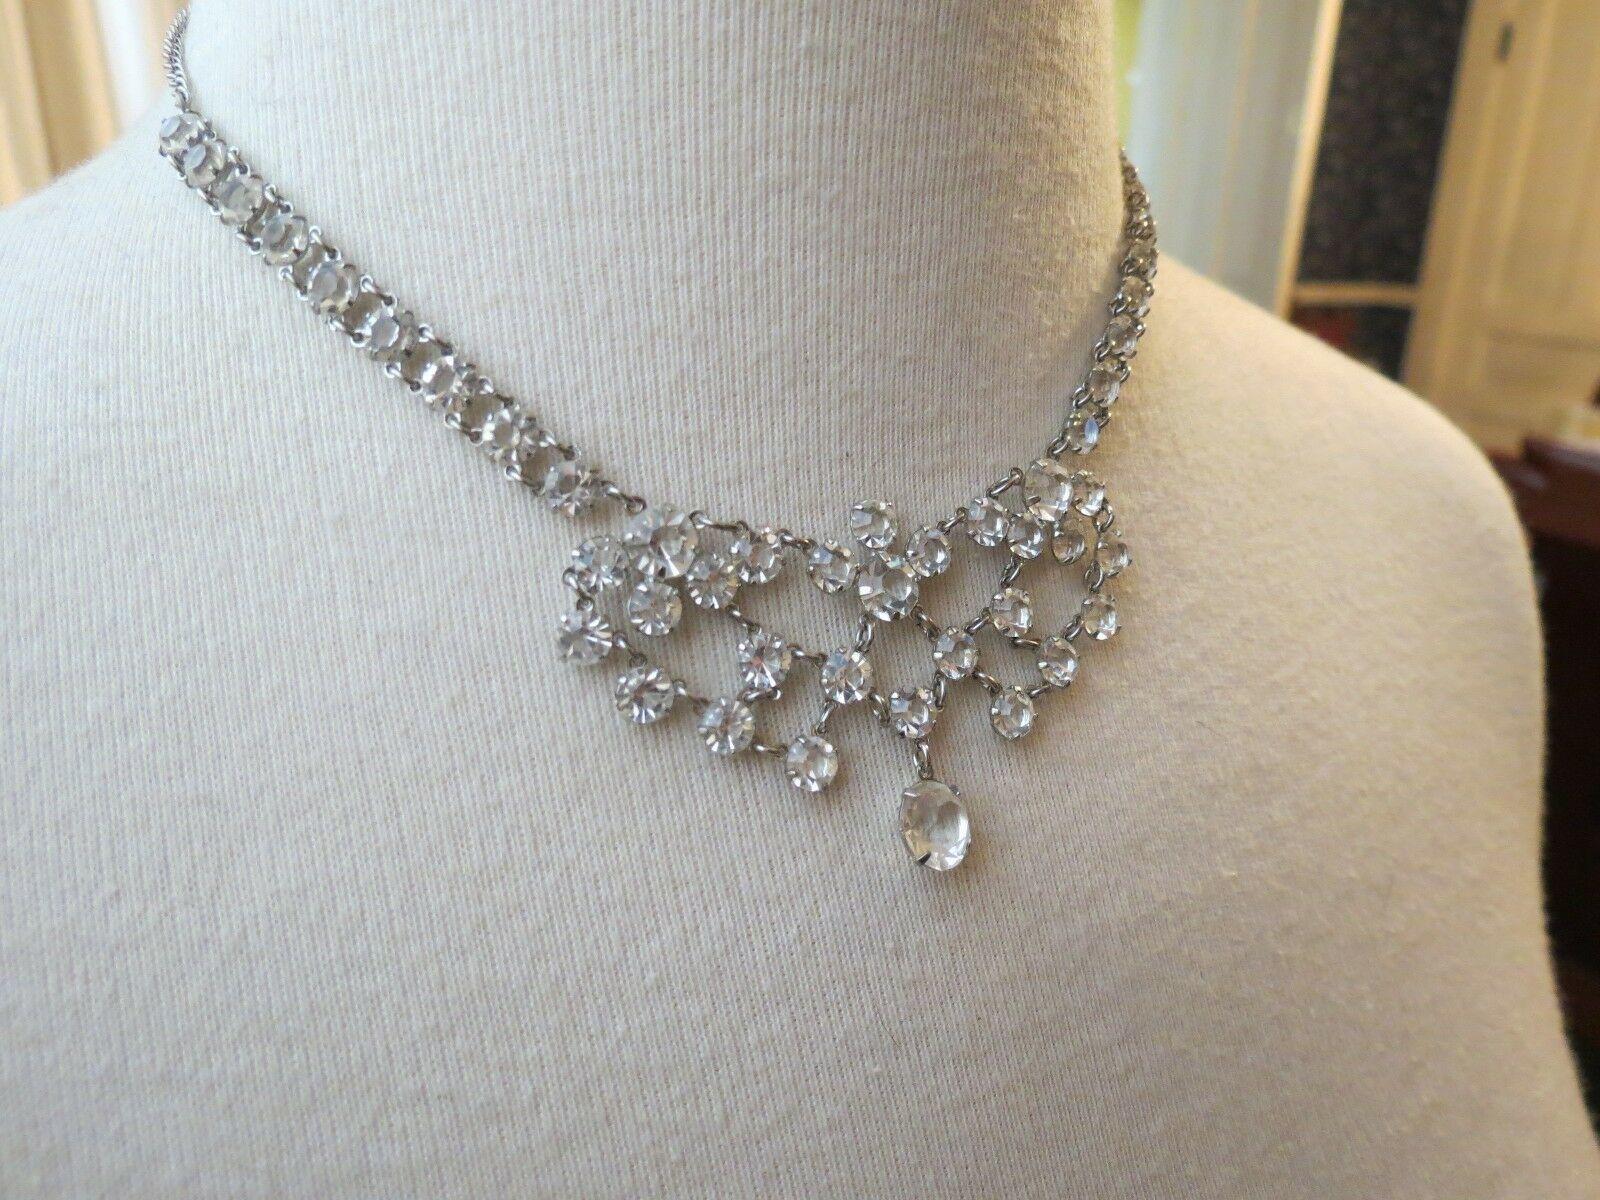 VTG Bezel Set Clear Crystal Necklace Choker Mini Bib Silver Plated Dangle Fringe